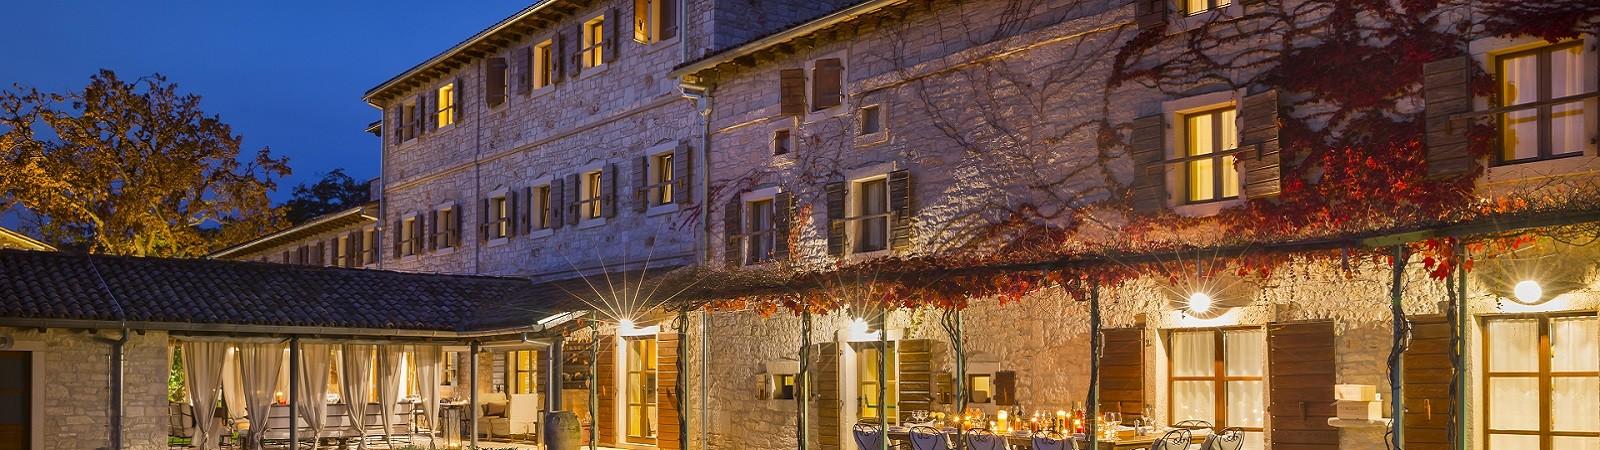 MENEGHETTI WINE HOTEL & WINERY - Istria